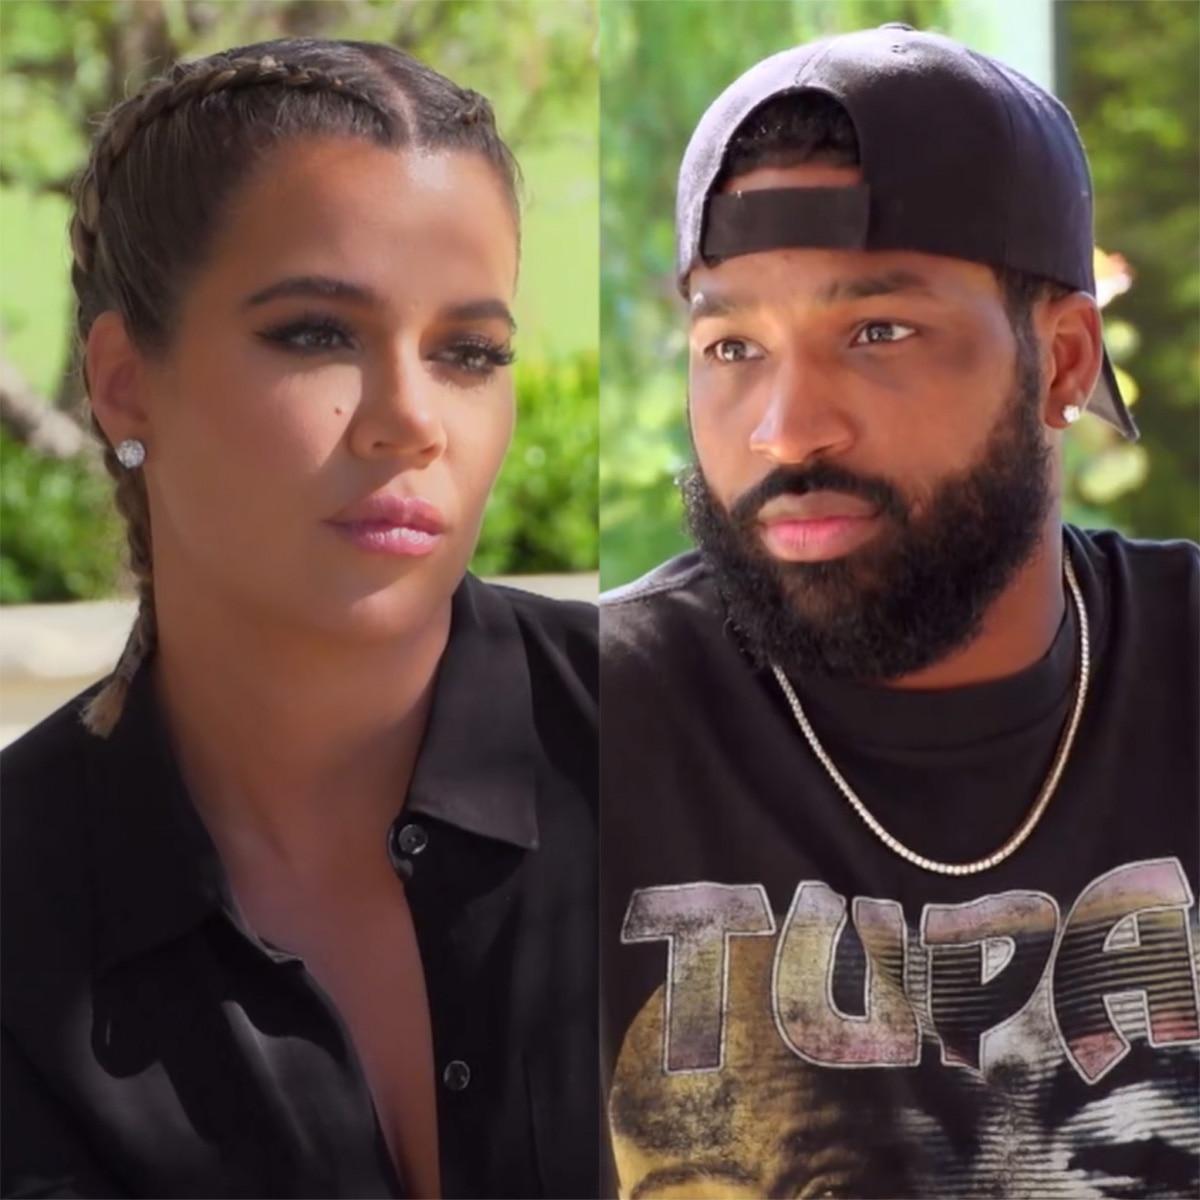 How Khloe Kardashian Really Feels About Tristan Thompson's Move to the Boston Celtics - E! NEWS